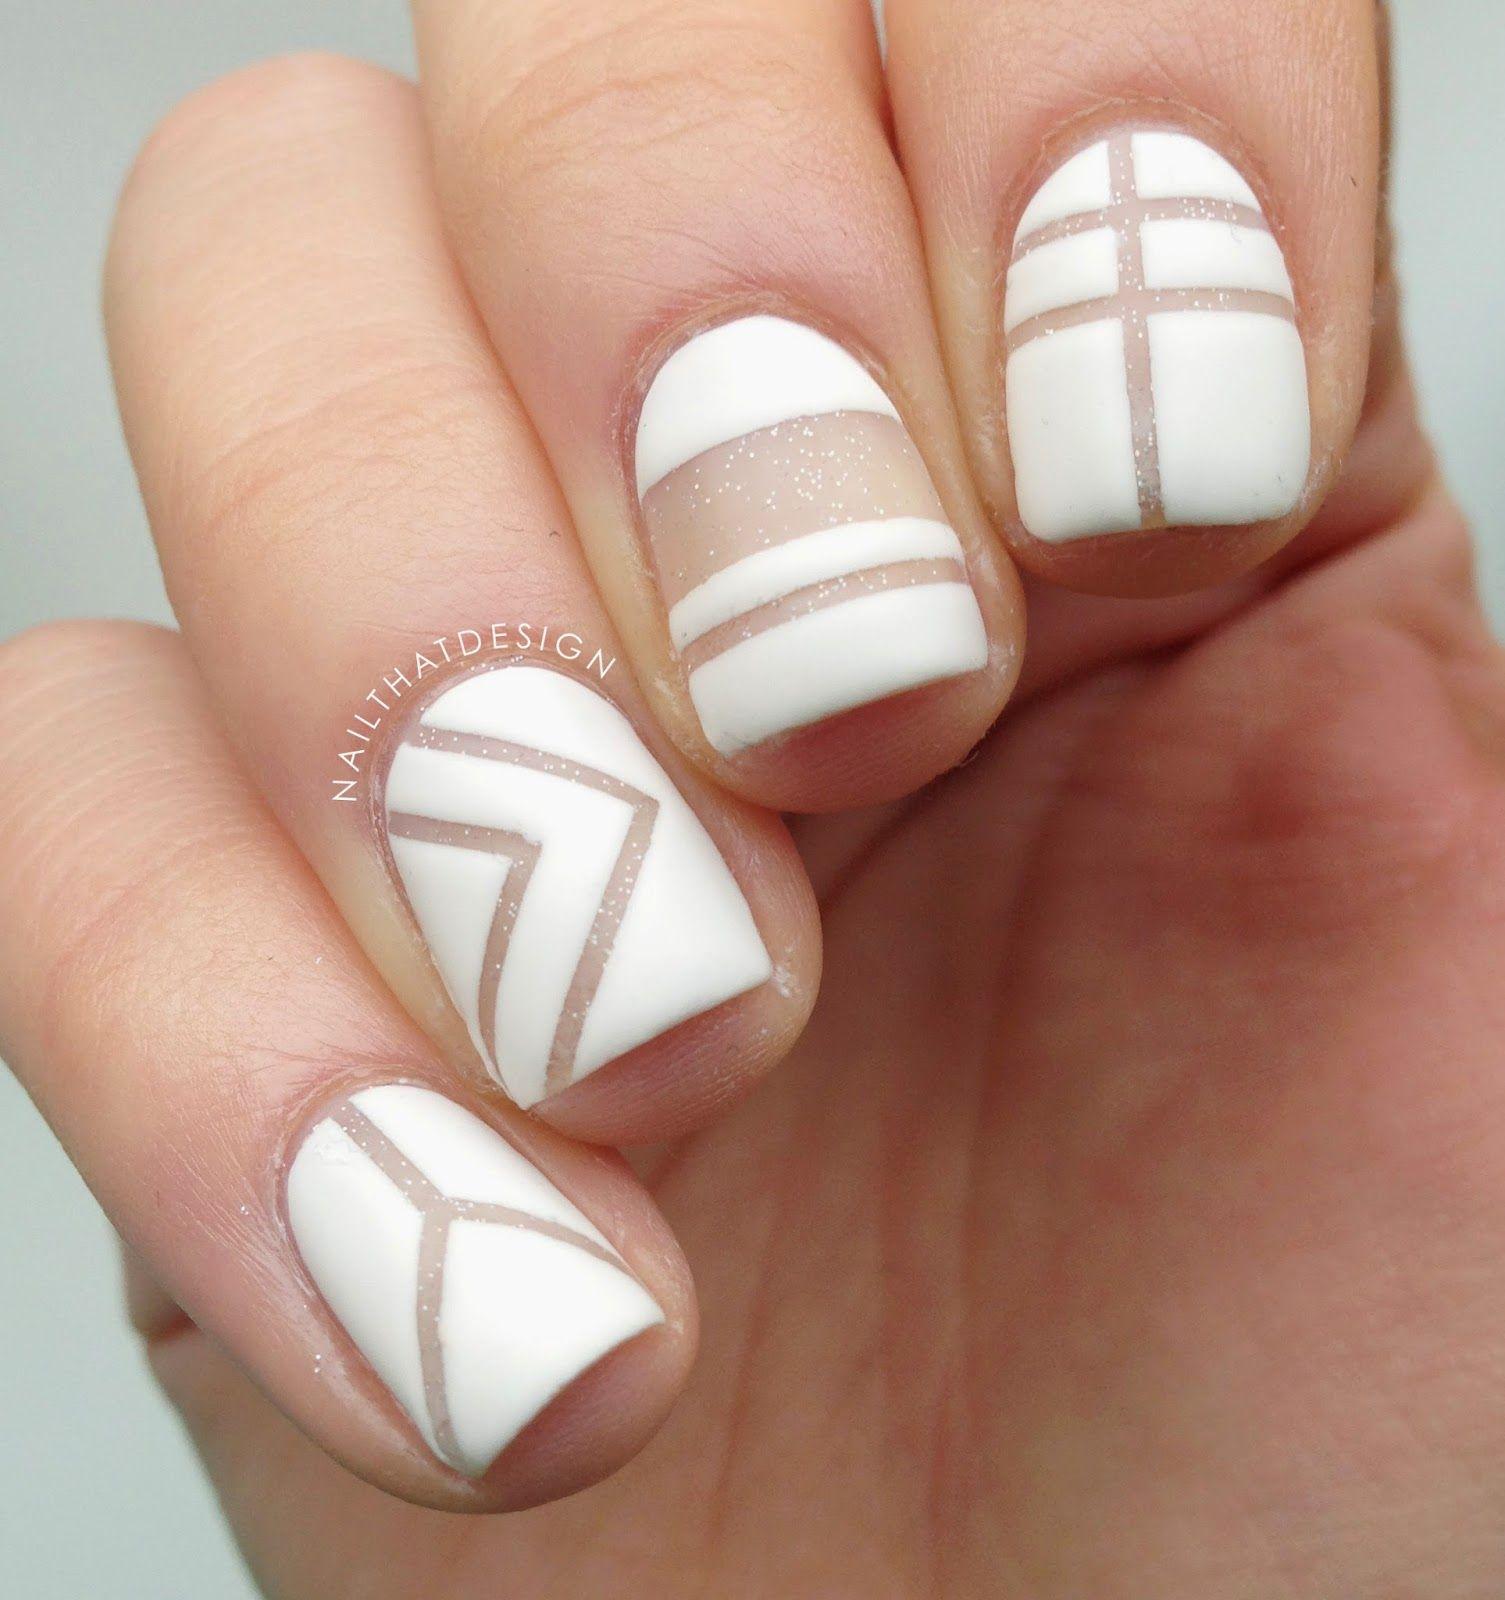 Dette er en blog om neglelak, nail art, og neglepleje. This is a blot about nail art, nails, swatches and more.